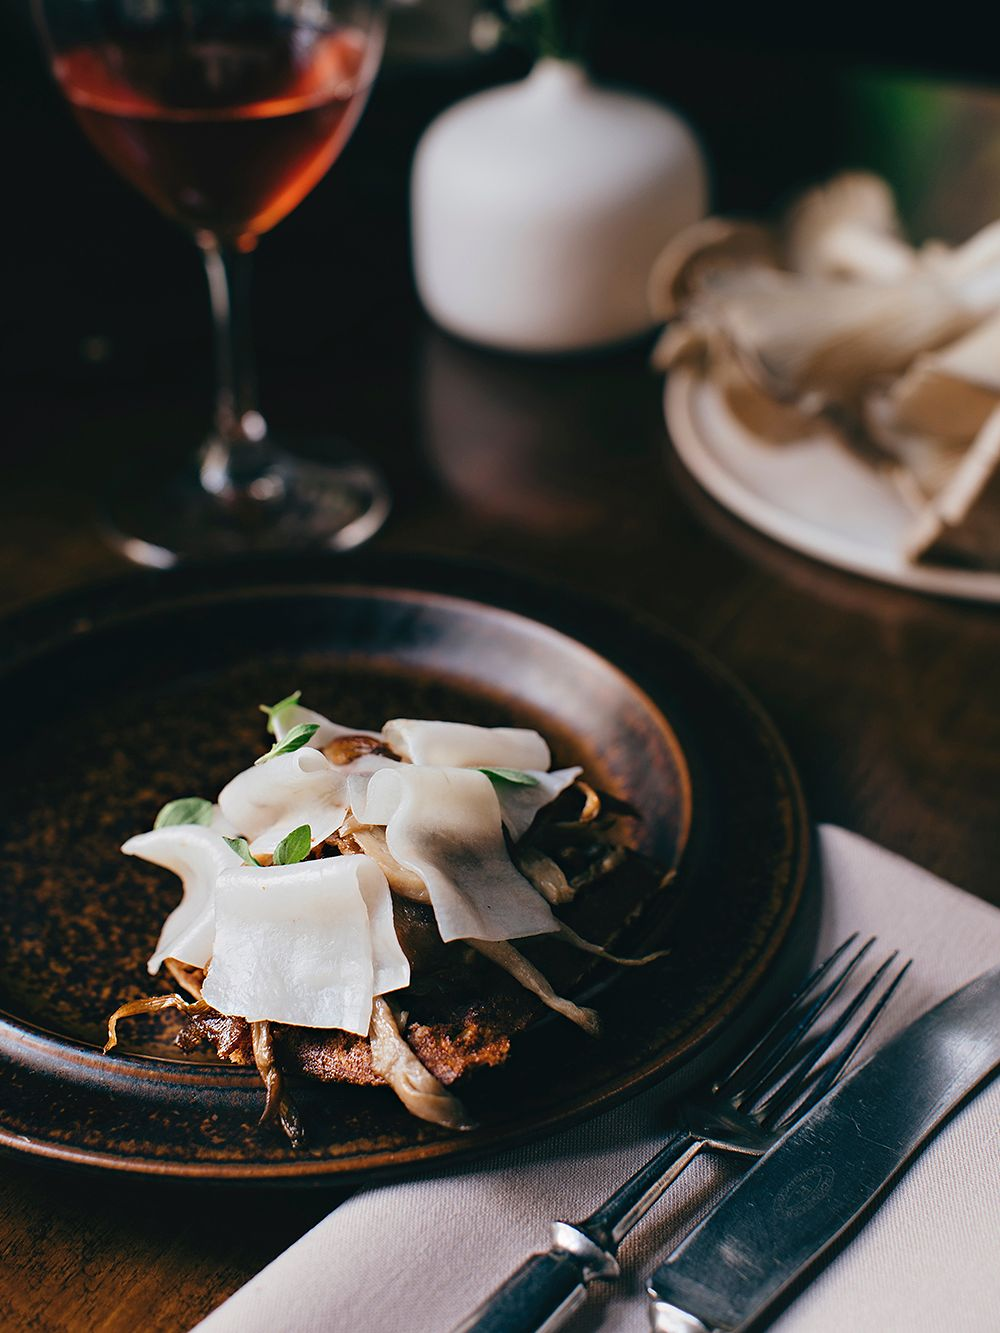 Nolla's crispy mushroom waffle